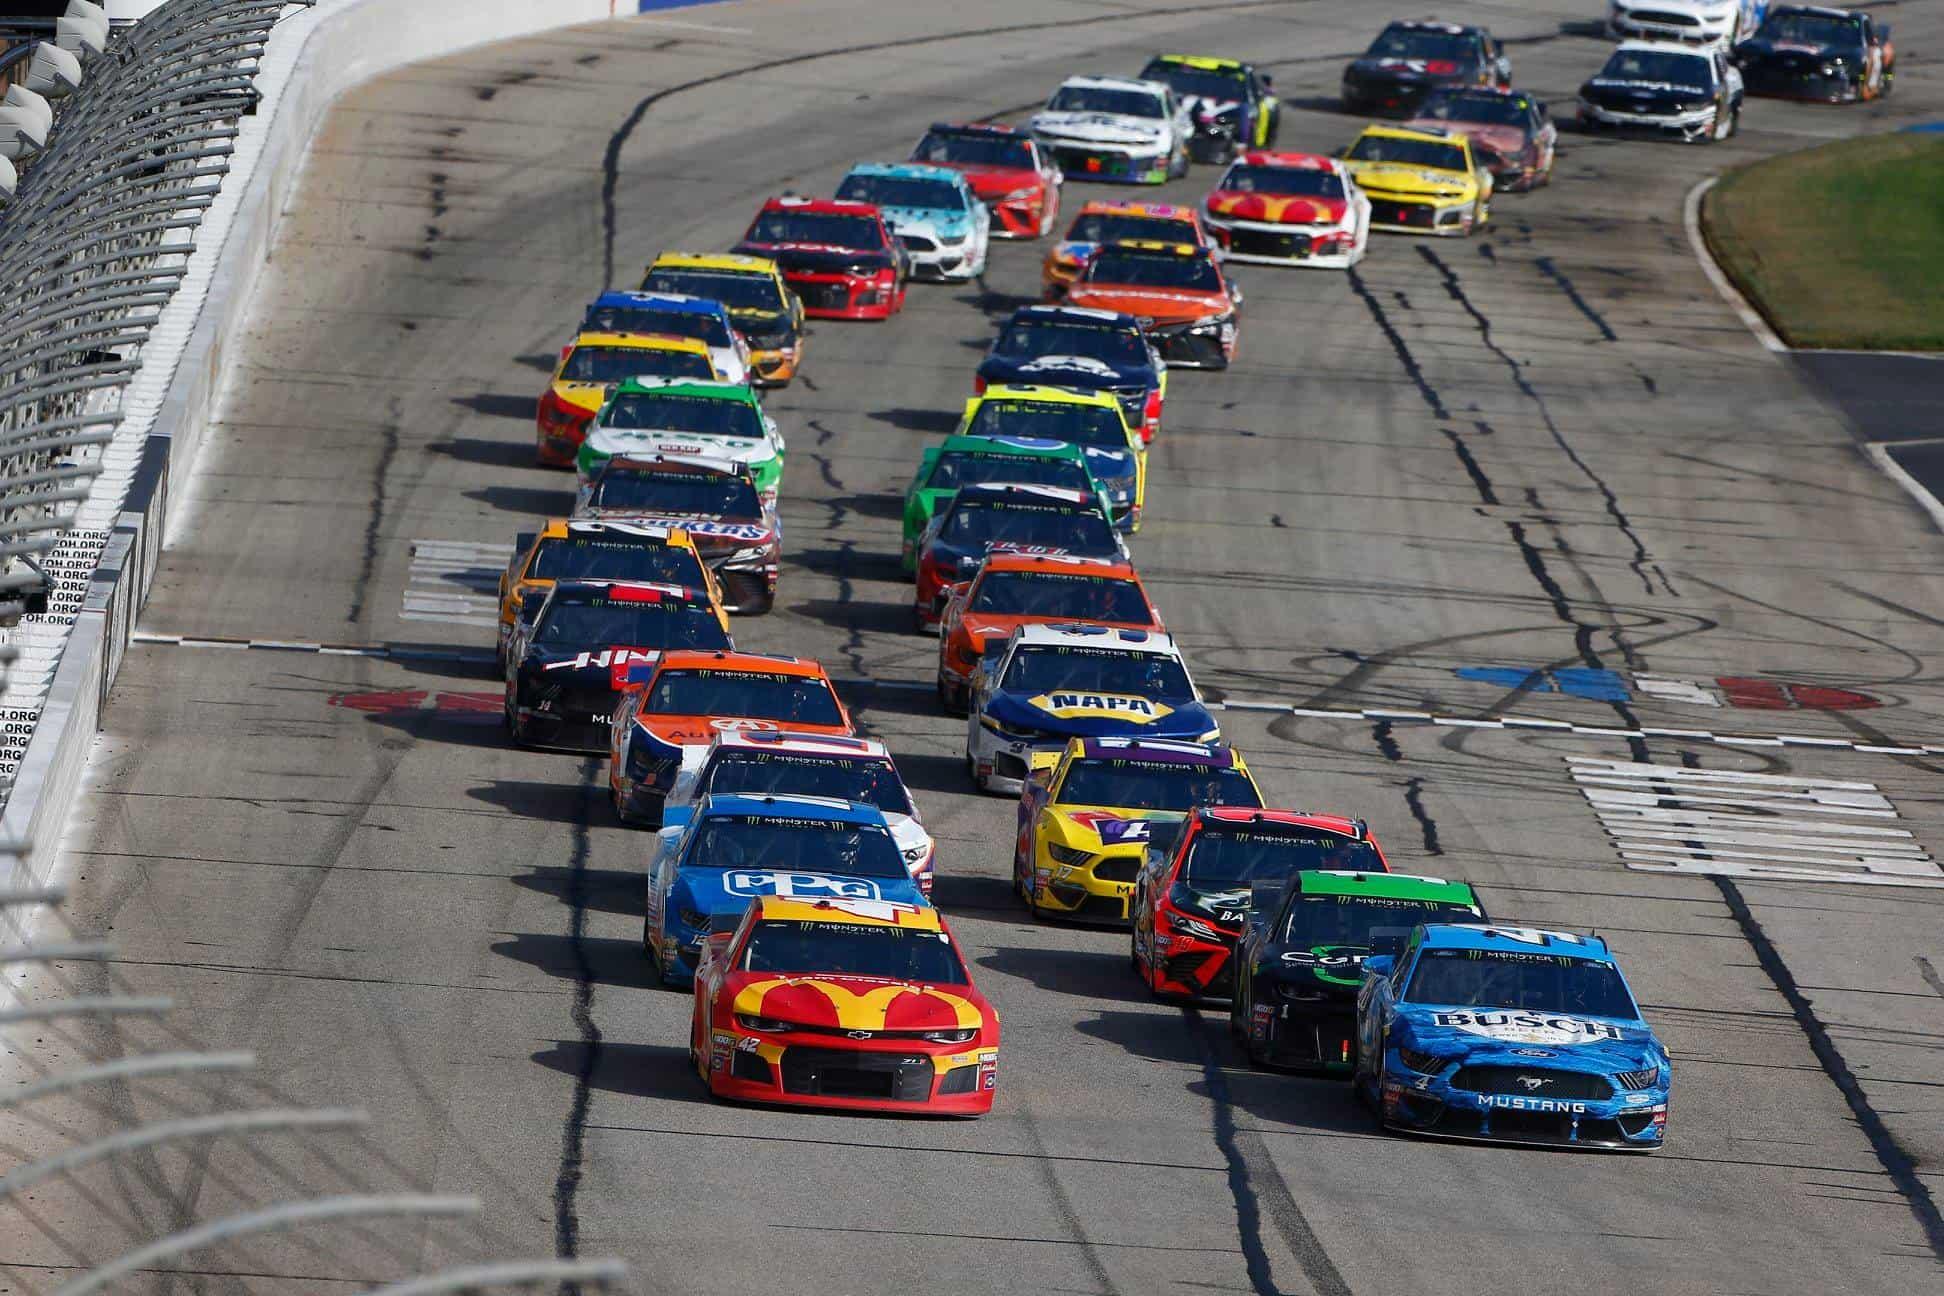 NASCAR at Atlanta Motor Speedway